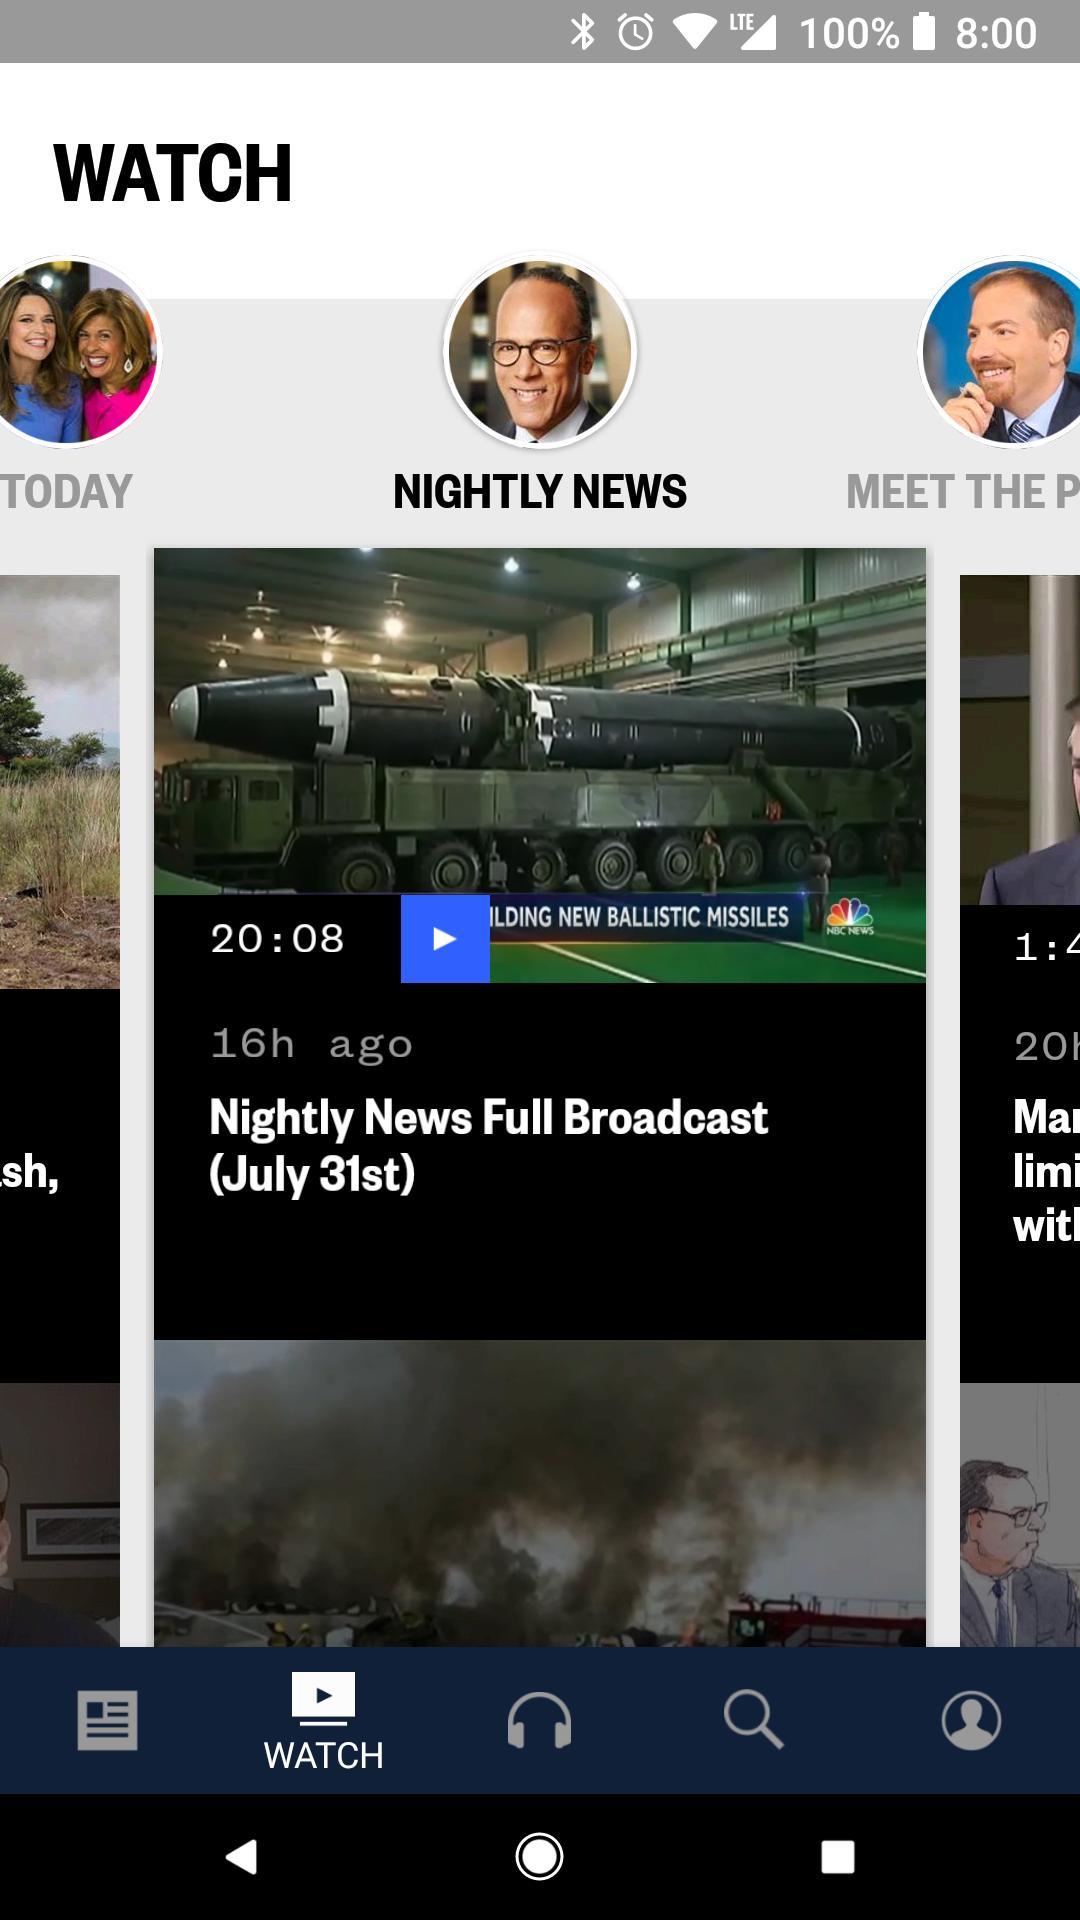 NBC News: Breaking News, US News & Live Video 6.0.11 Screenshot 2